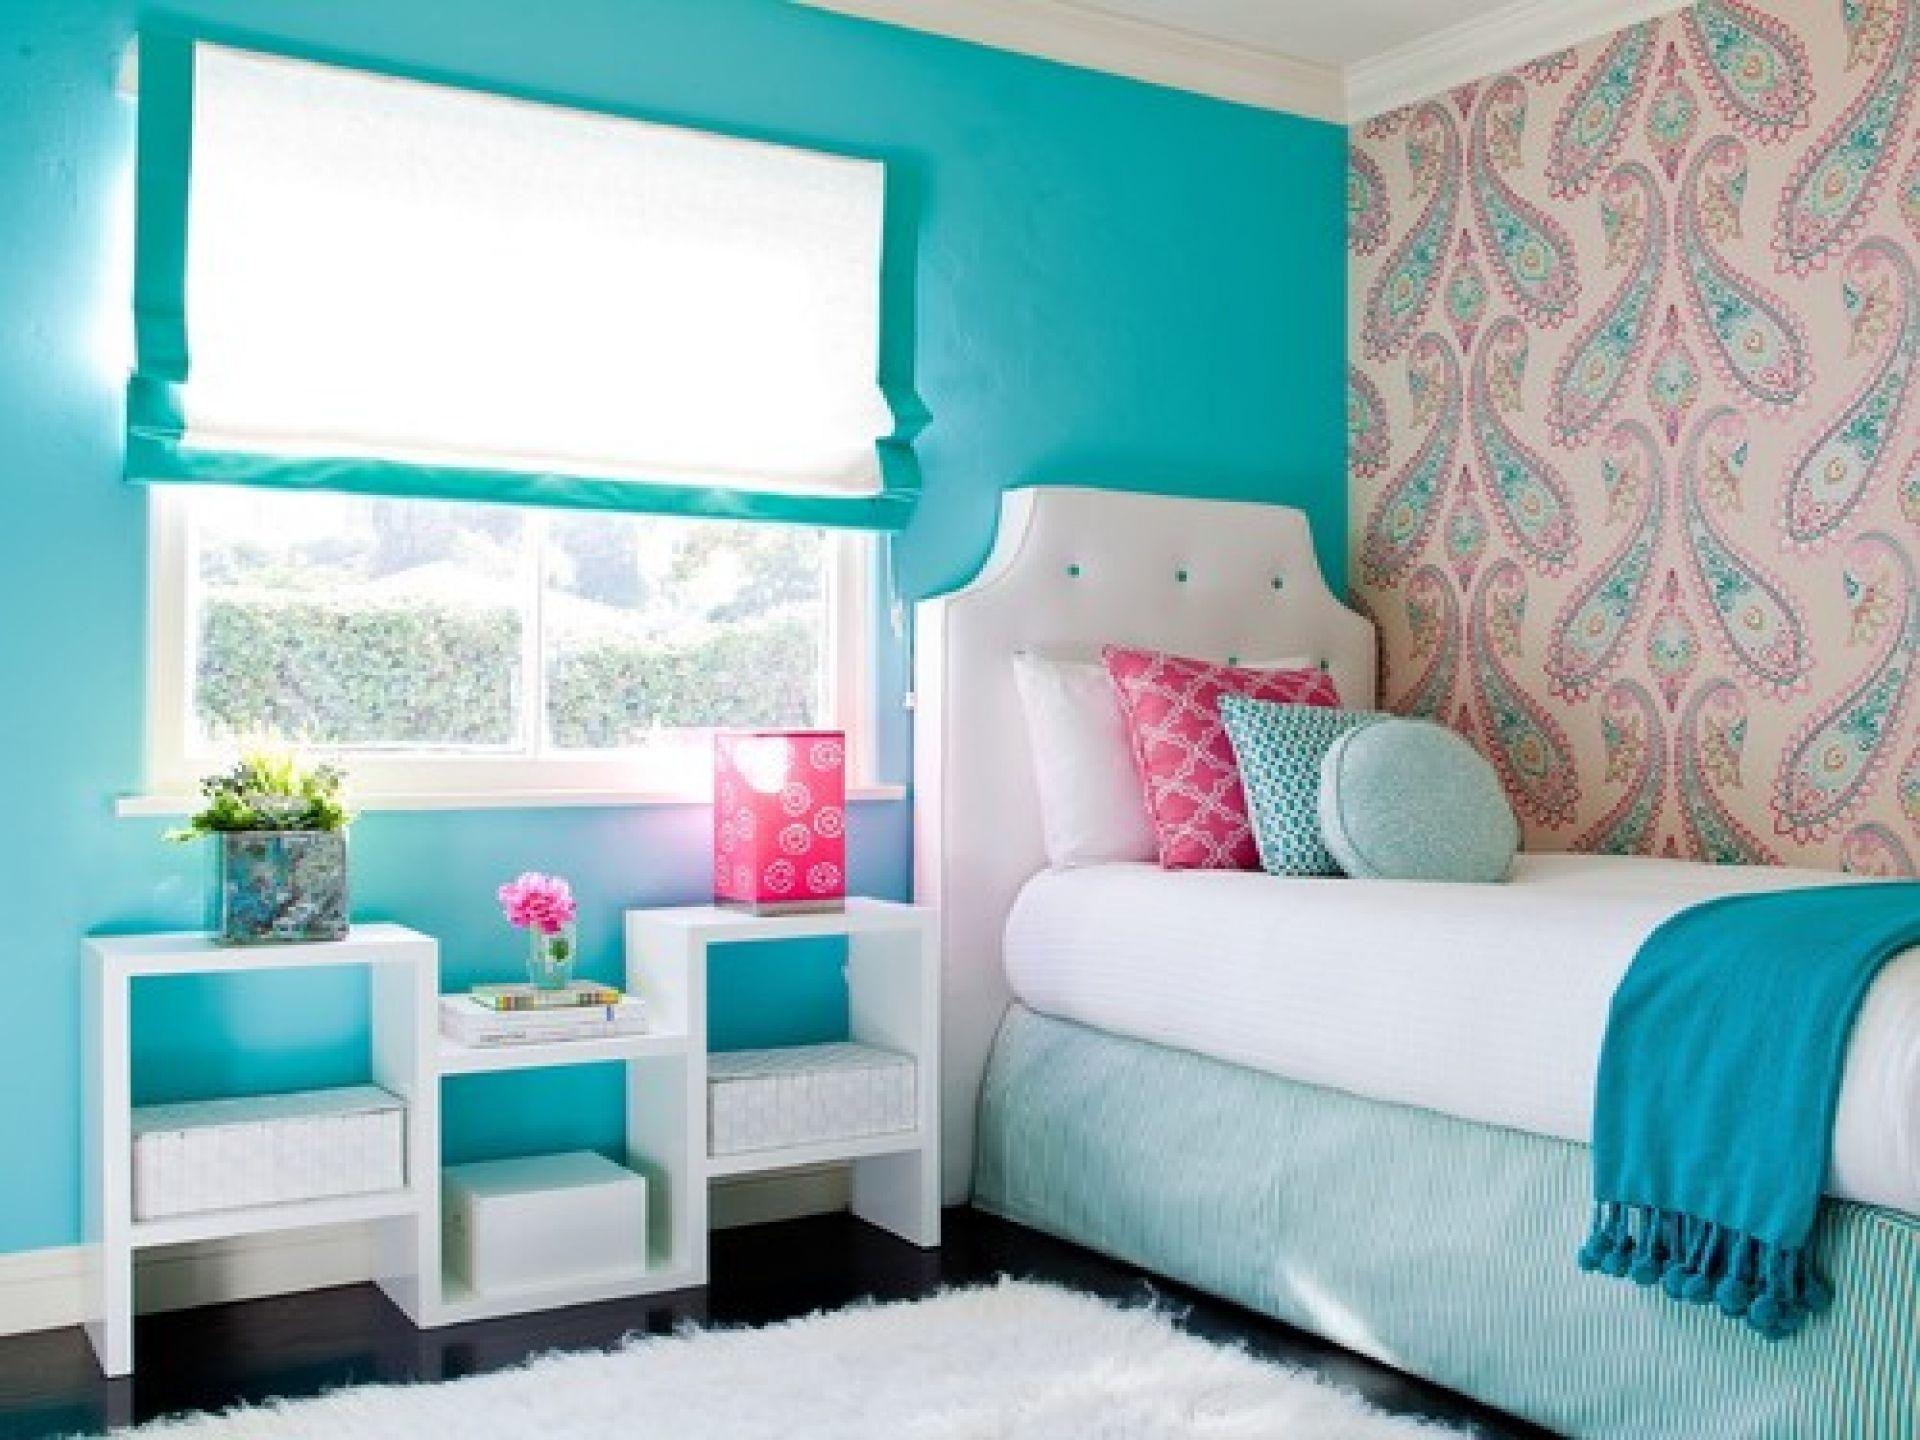 8+ Beautiful Bedroom Designs For Teenage Girls - Beautiful